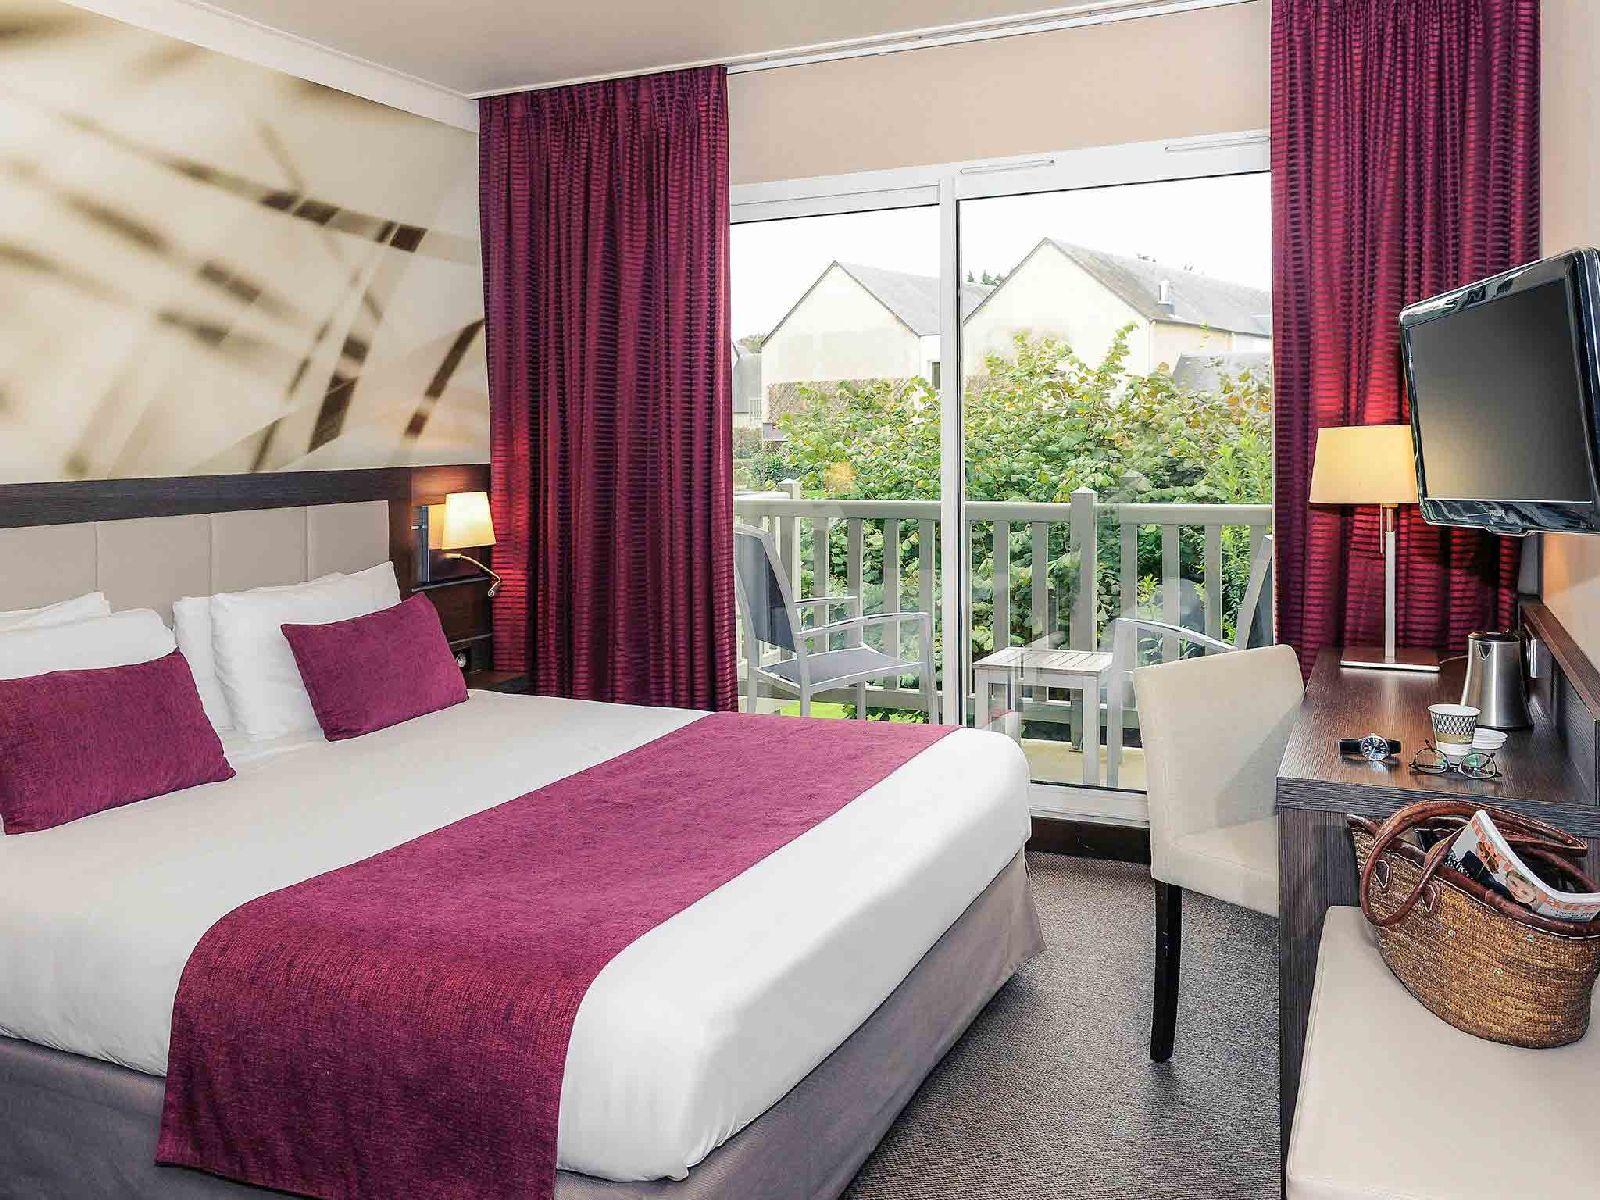 golf-expedition-golf-reizen-frankrijk-regio-normandië-hotel-mercure-omaha-beach-rood-wit-interieur-slaapkamer-met-balkon.jpg